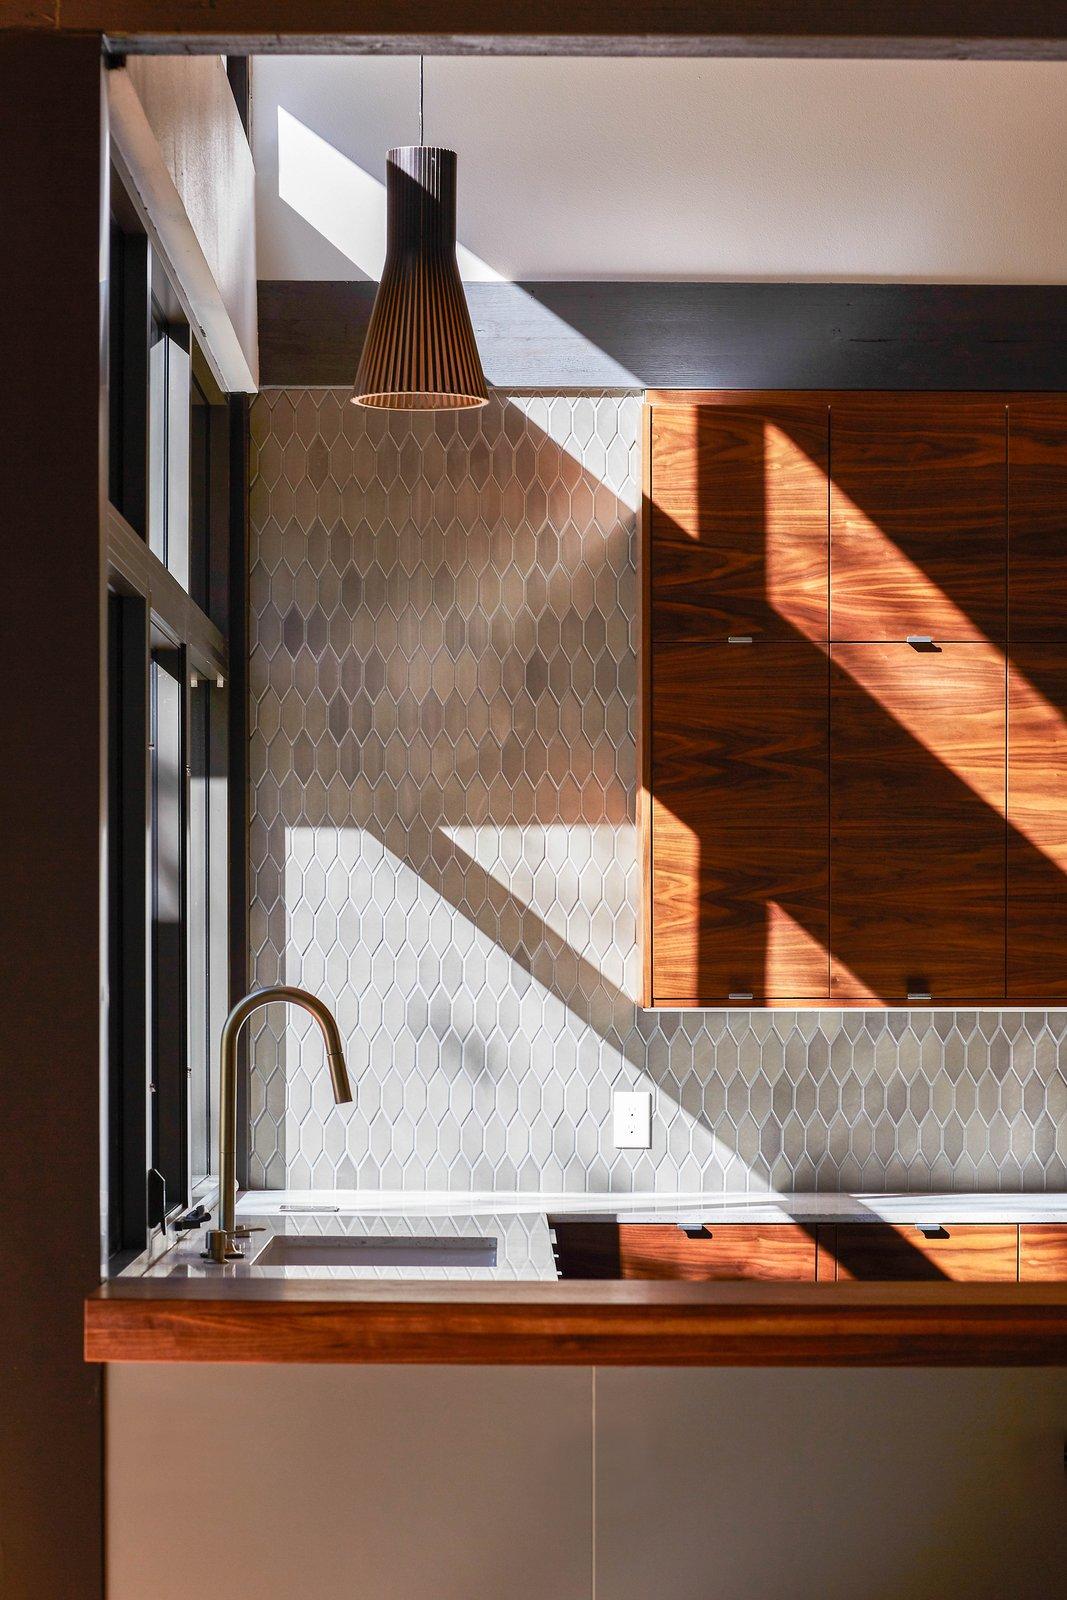 Kitchen, Undermount, Wood, Engineered Quartz, Wood, Ceramic Tile, Light Hardwood, and Pendant  Best Kitchen Wood Wood Undermount Pendant Light Hardwood Photos from House  //  TW